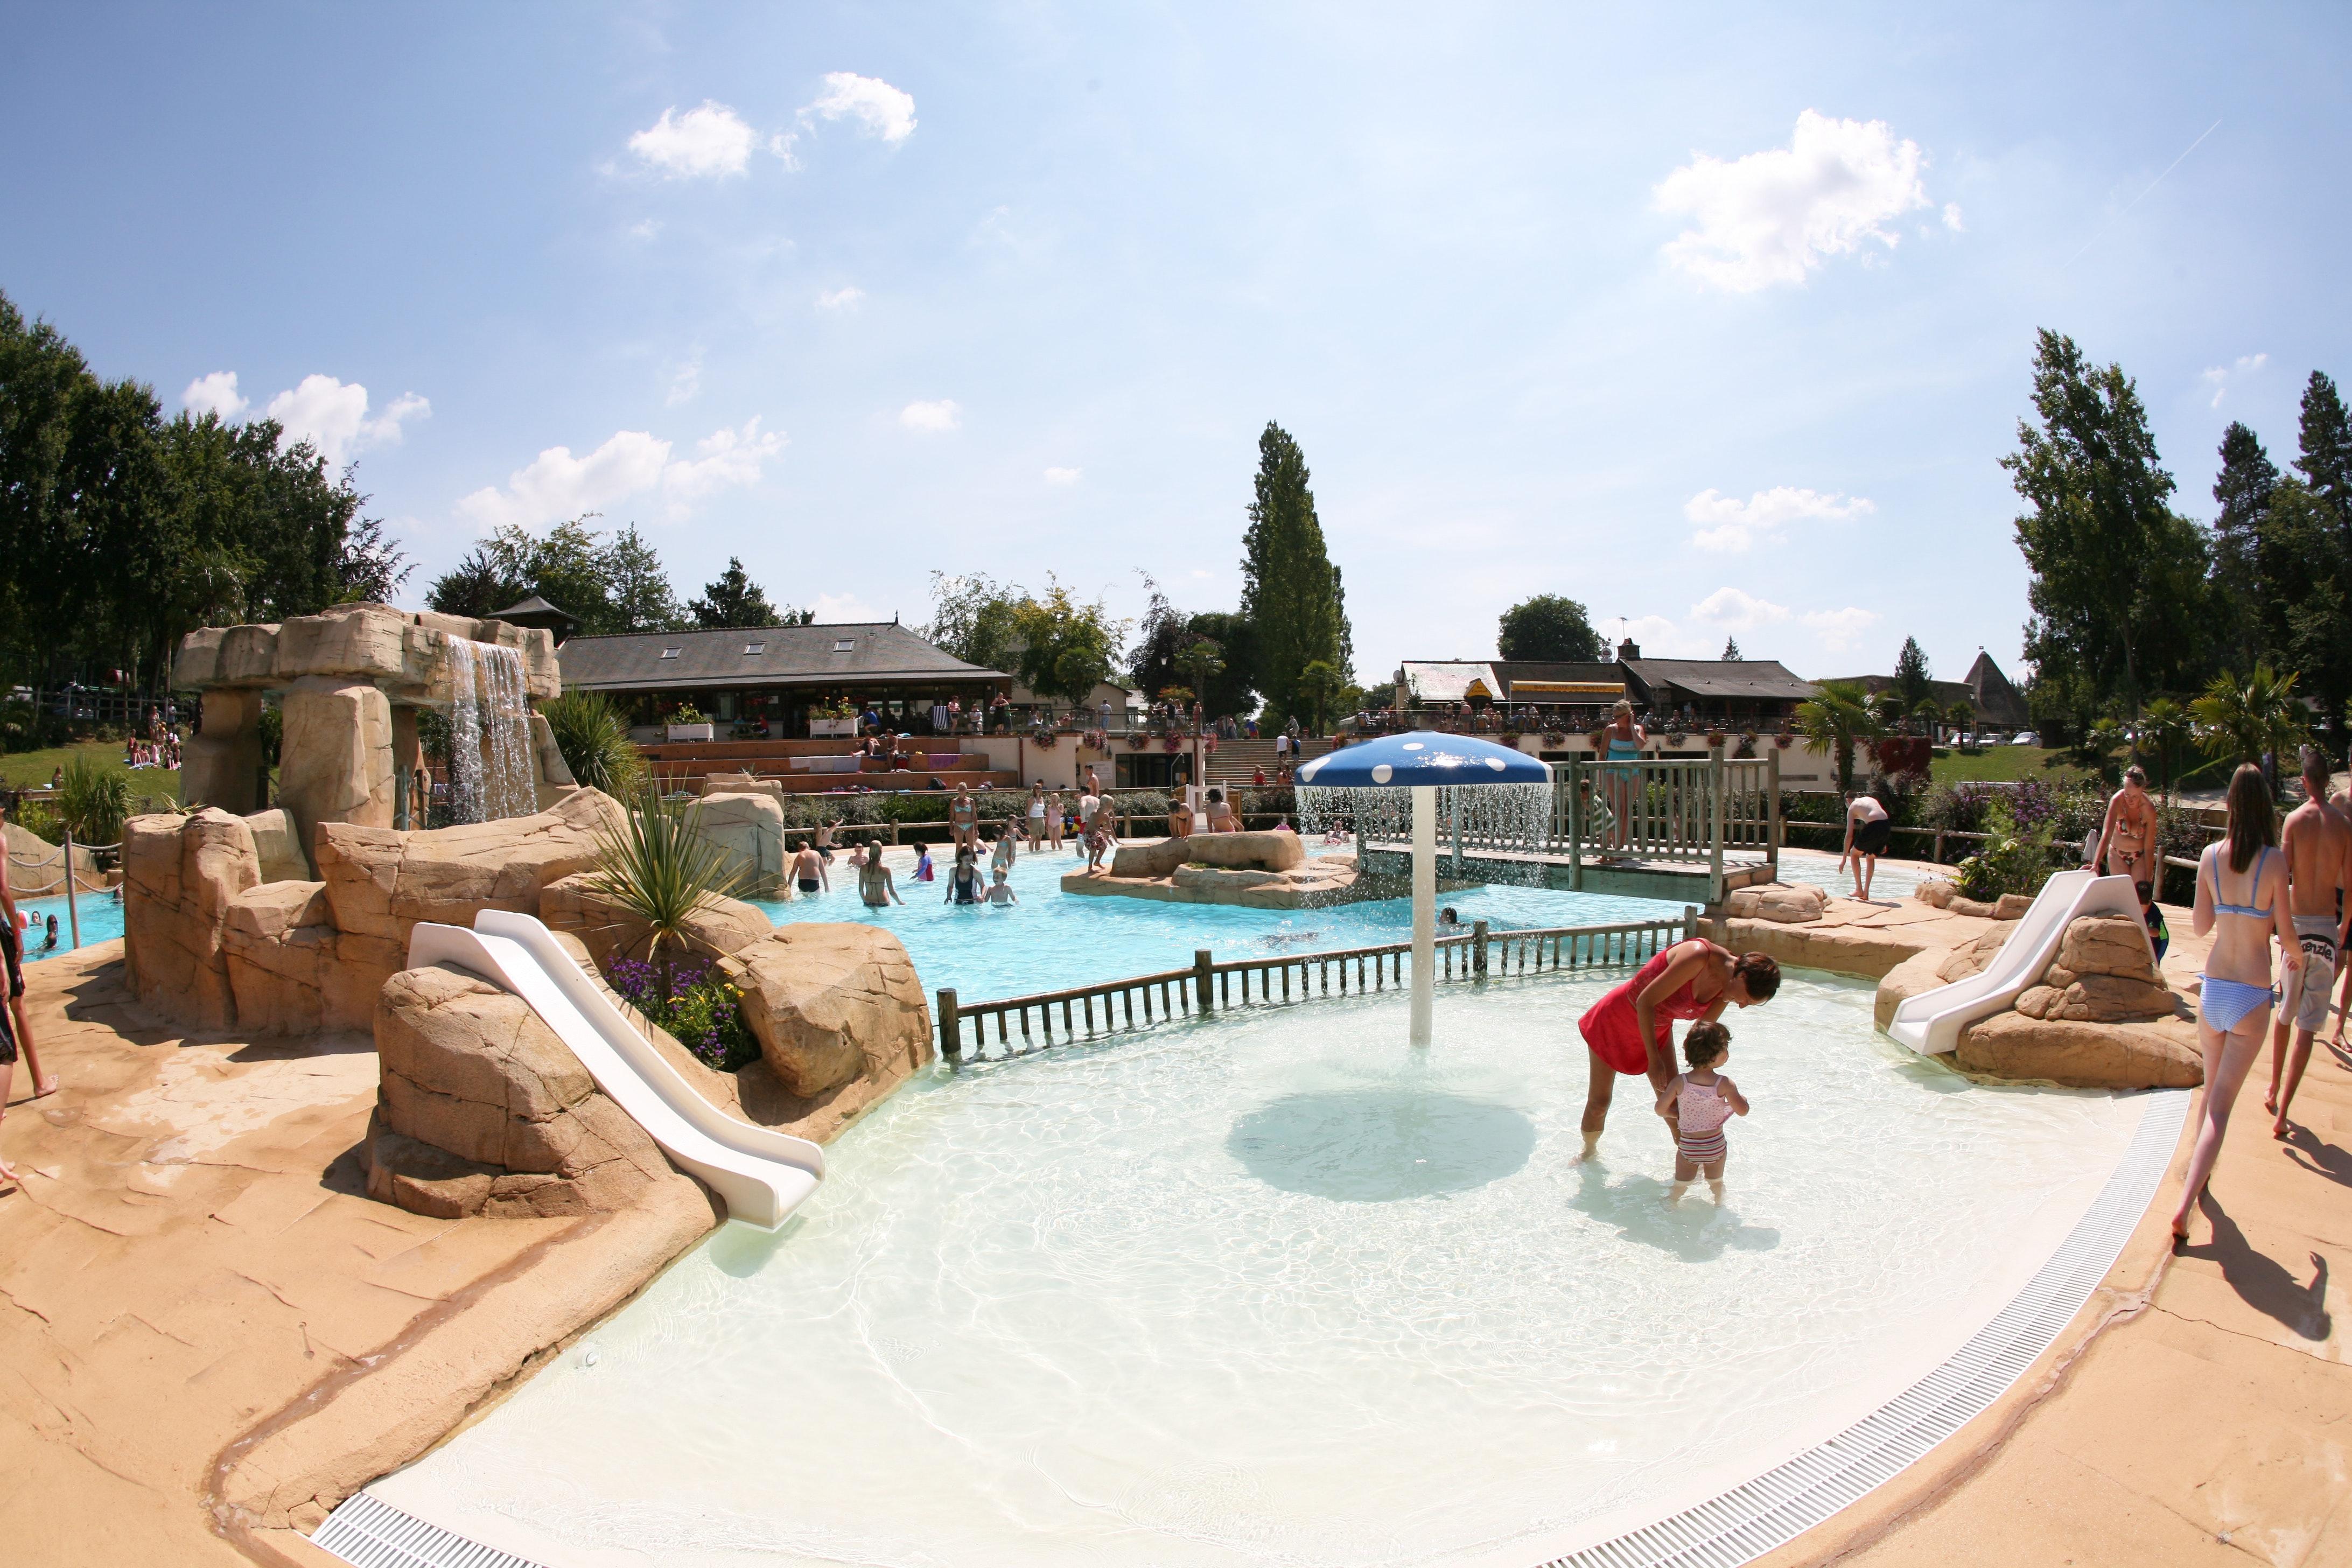 Camping Domaine des Ormes spelen in kinderbad